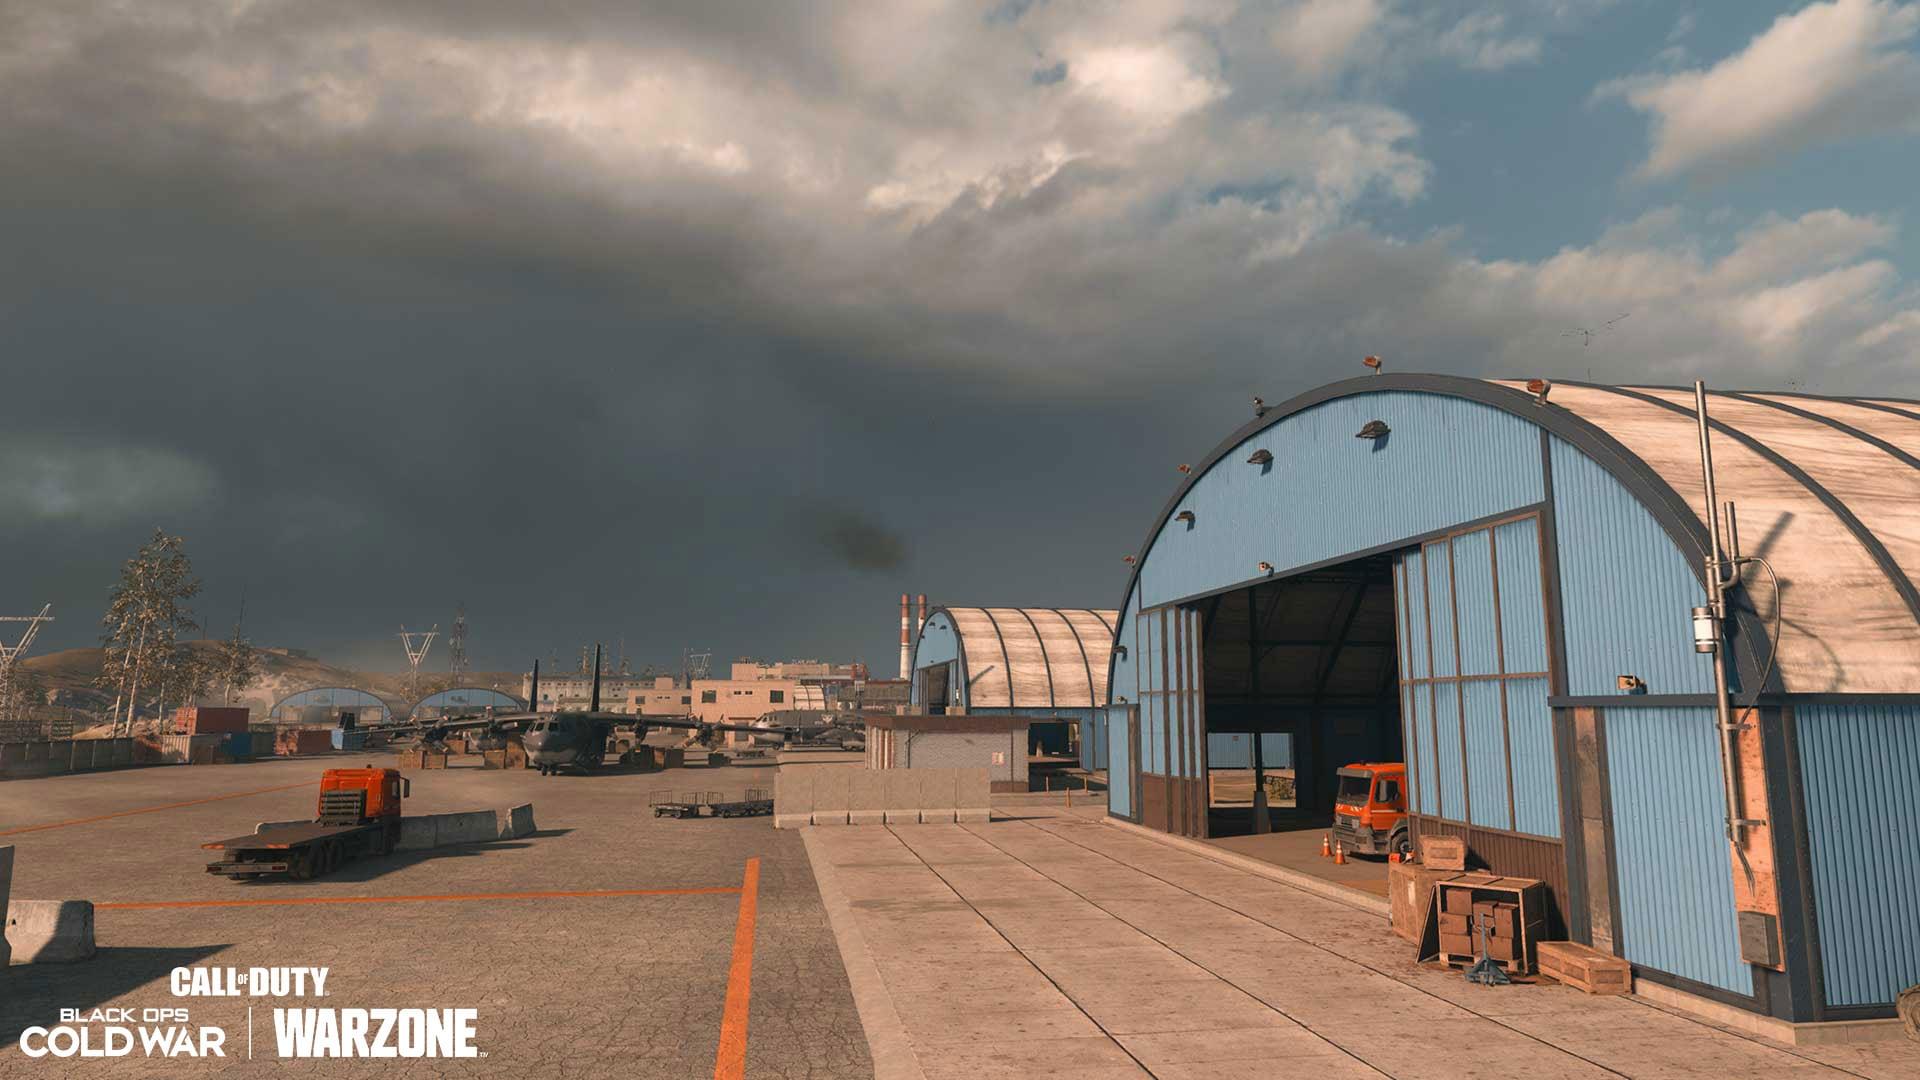 Blue warehouses